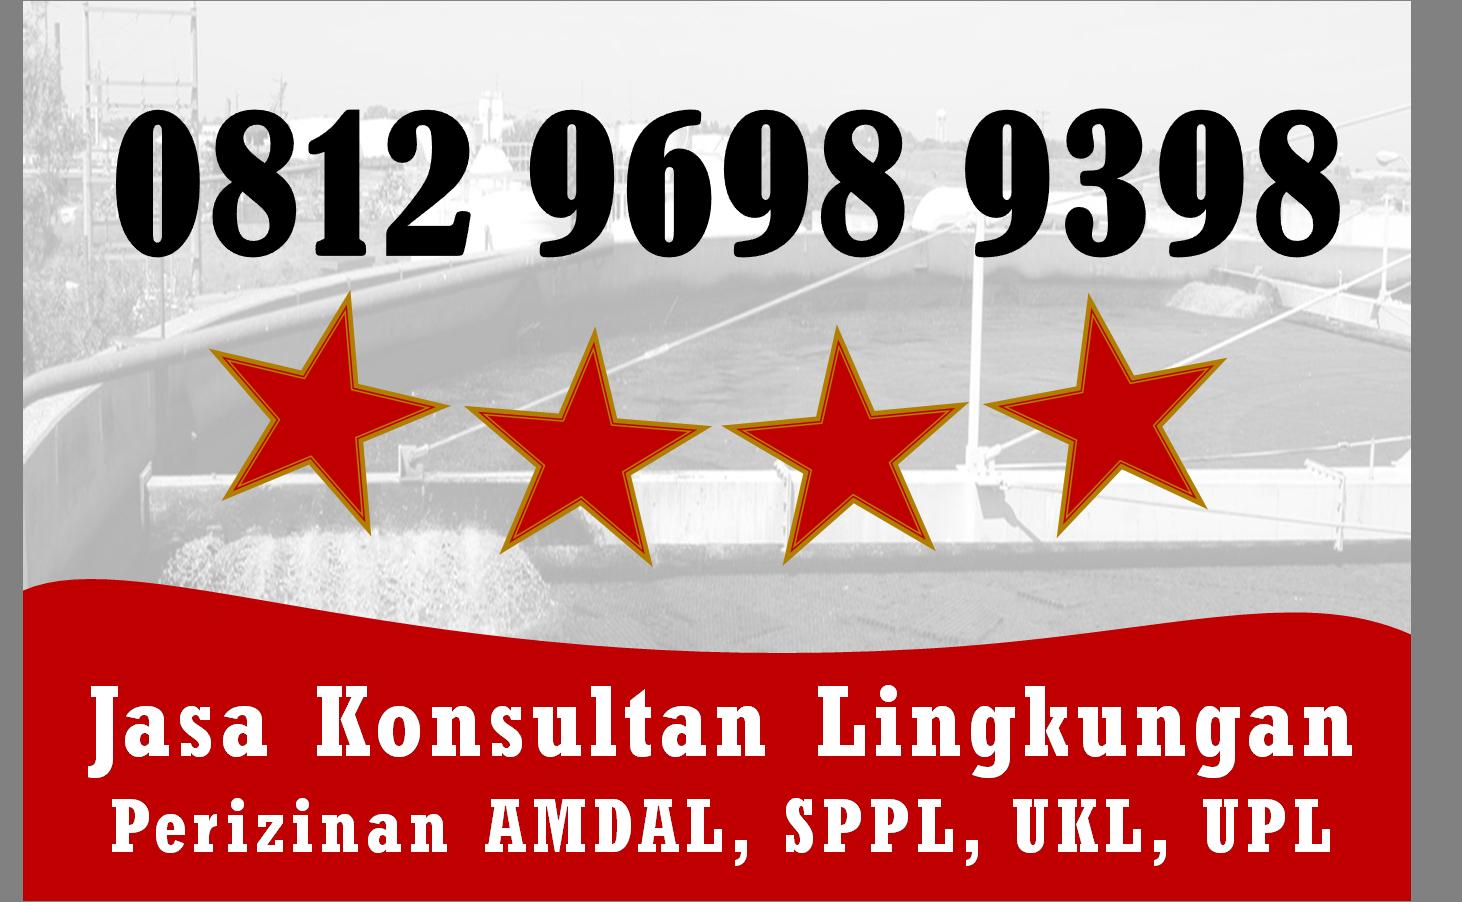 Order Sekarang Telp Wa 0812 9698 9398 Contoh Dokumen Ukl Upl Rumah Sakit Jambi Kota Manado Teknik Lingkungan Kota Balikpapan